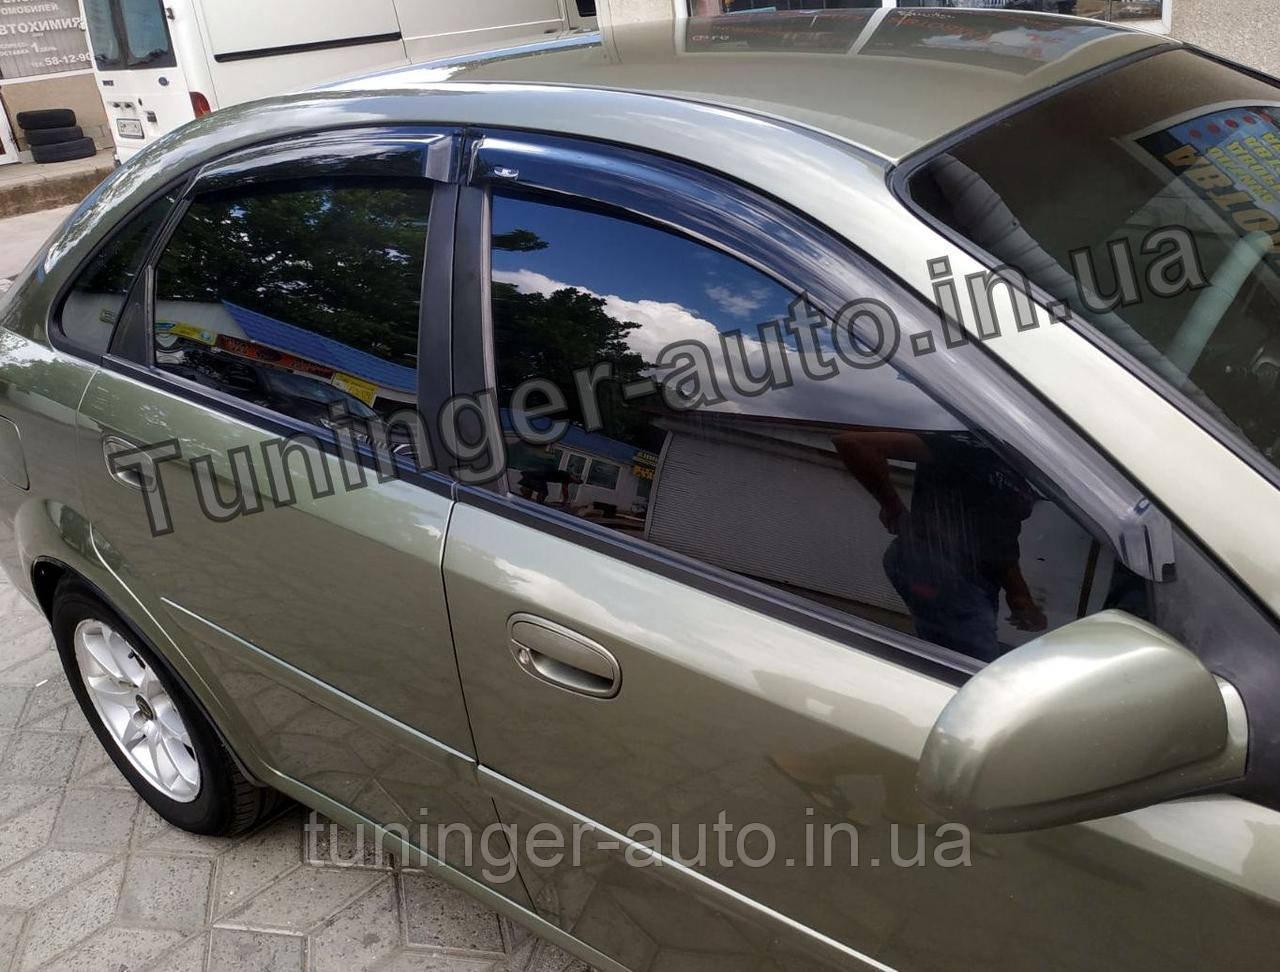 Дефлекторы окон (Ветровики) Chevrolet Lacetti 2004-2012 (Hic)